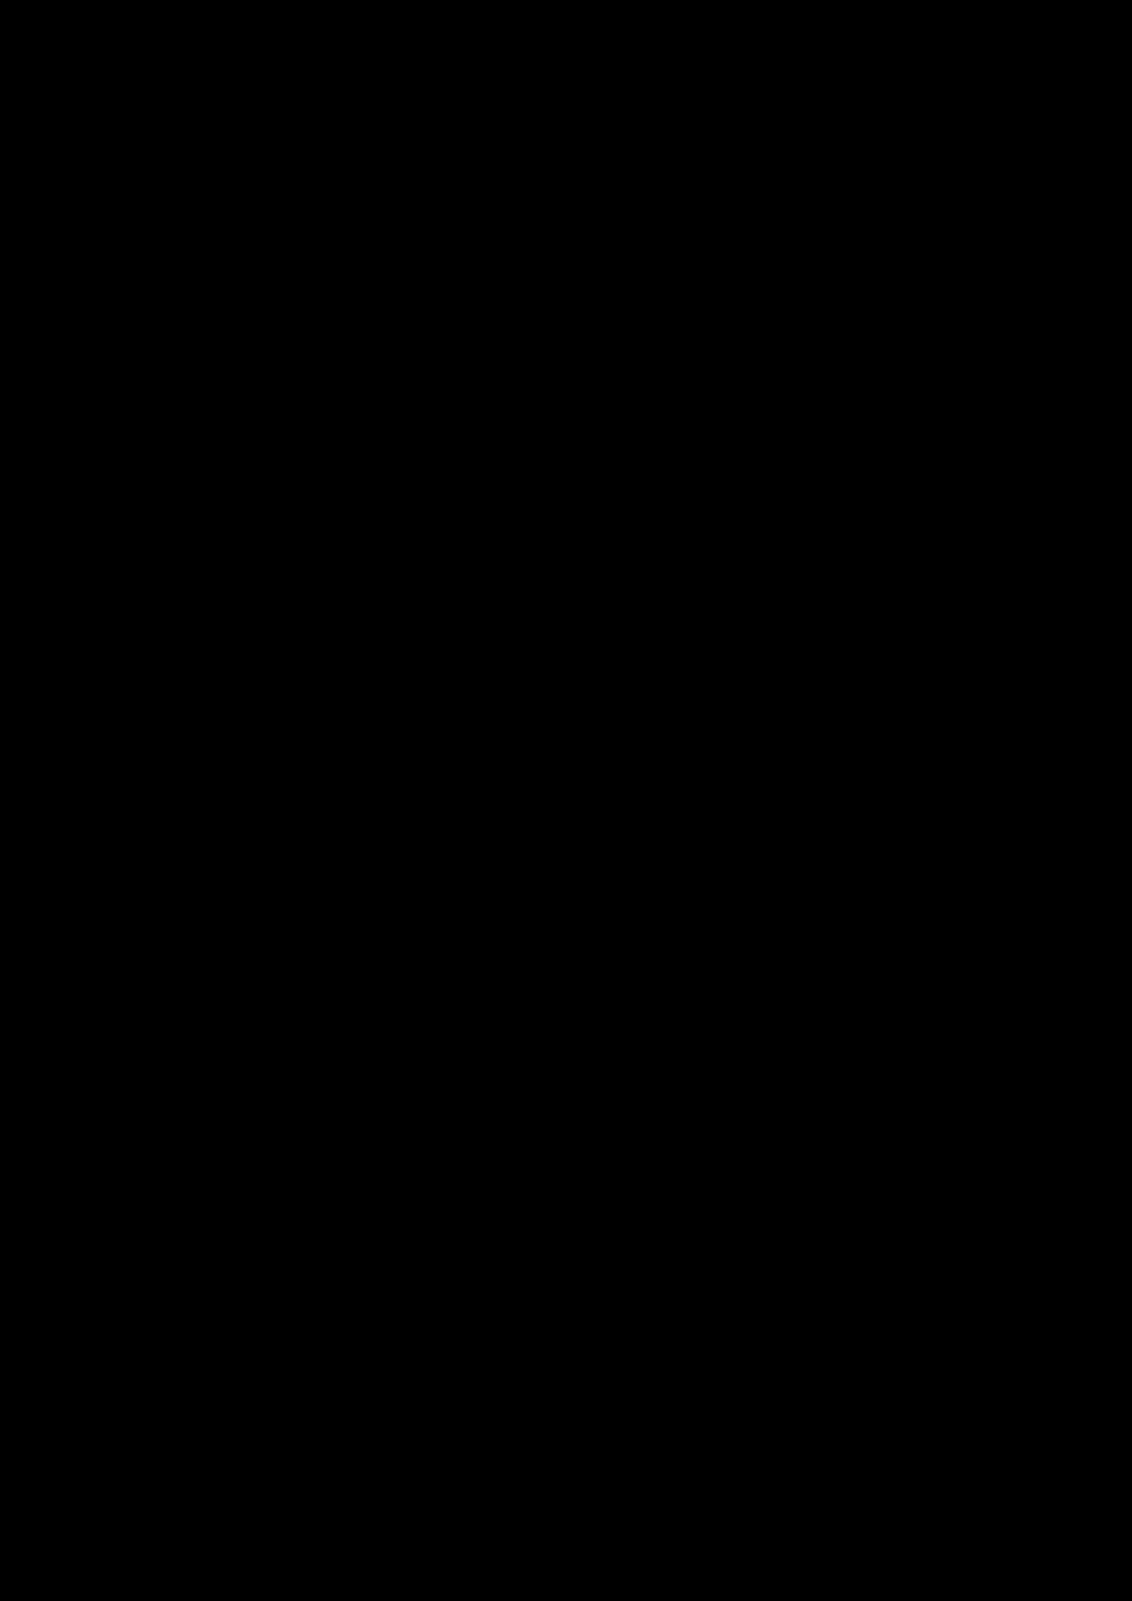 Prosti slide, Image 43